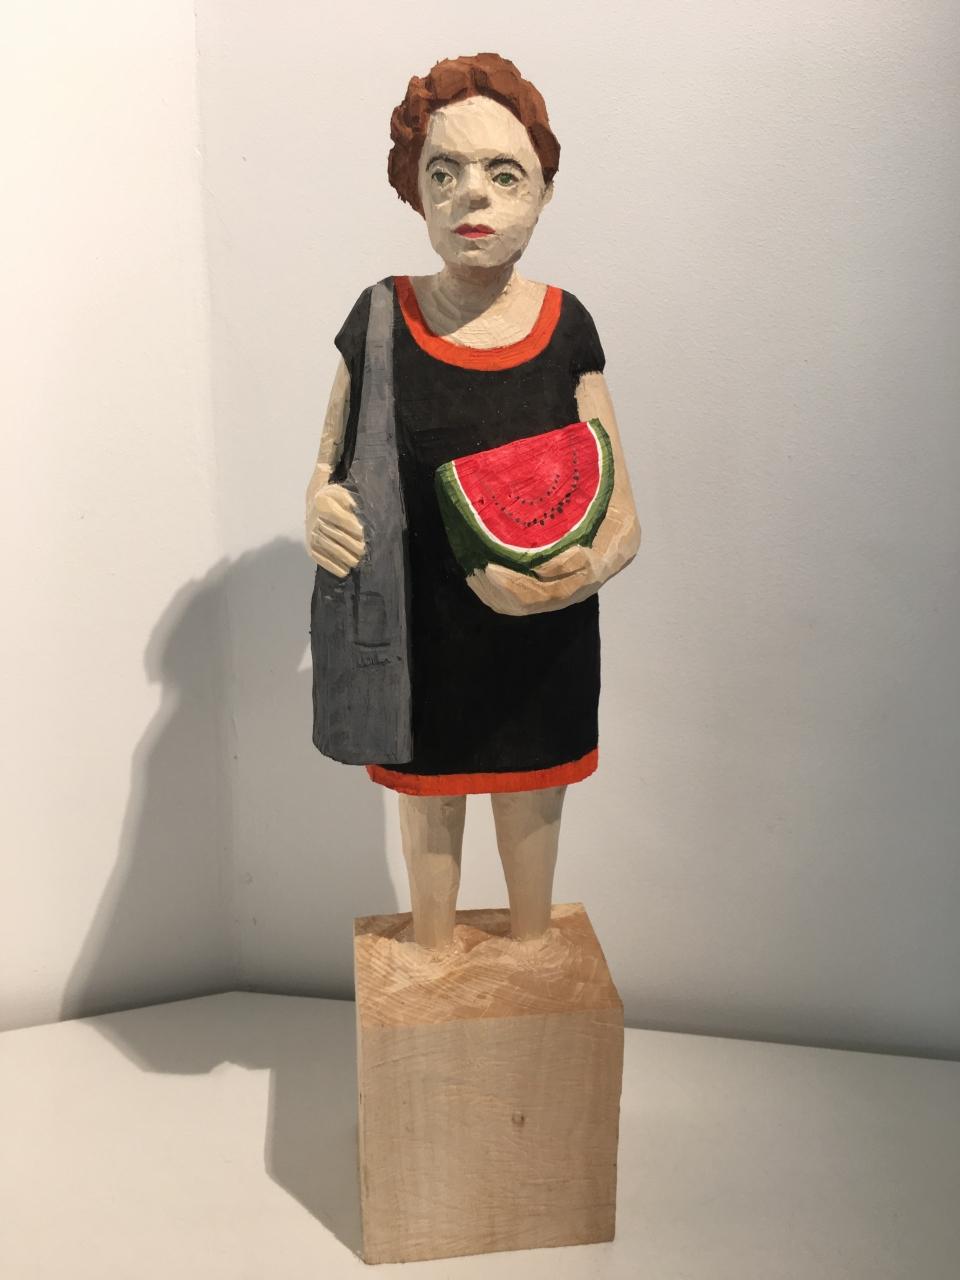 Edekafrau (1335) mit Wassermelone